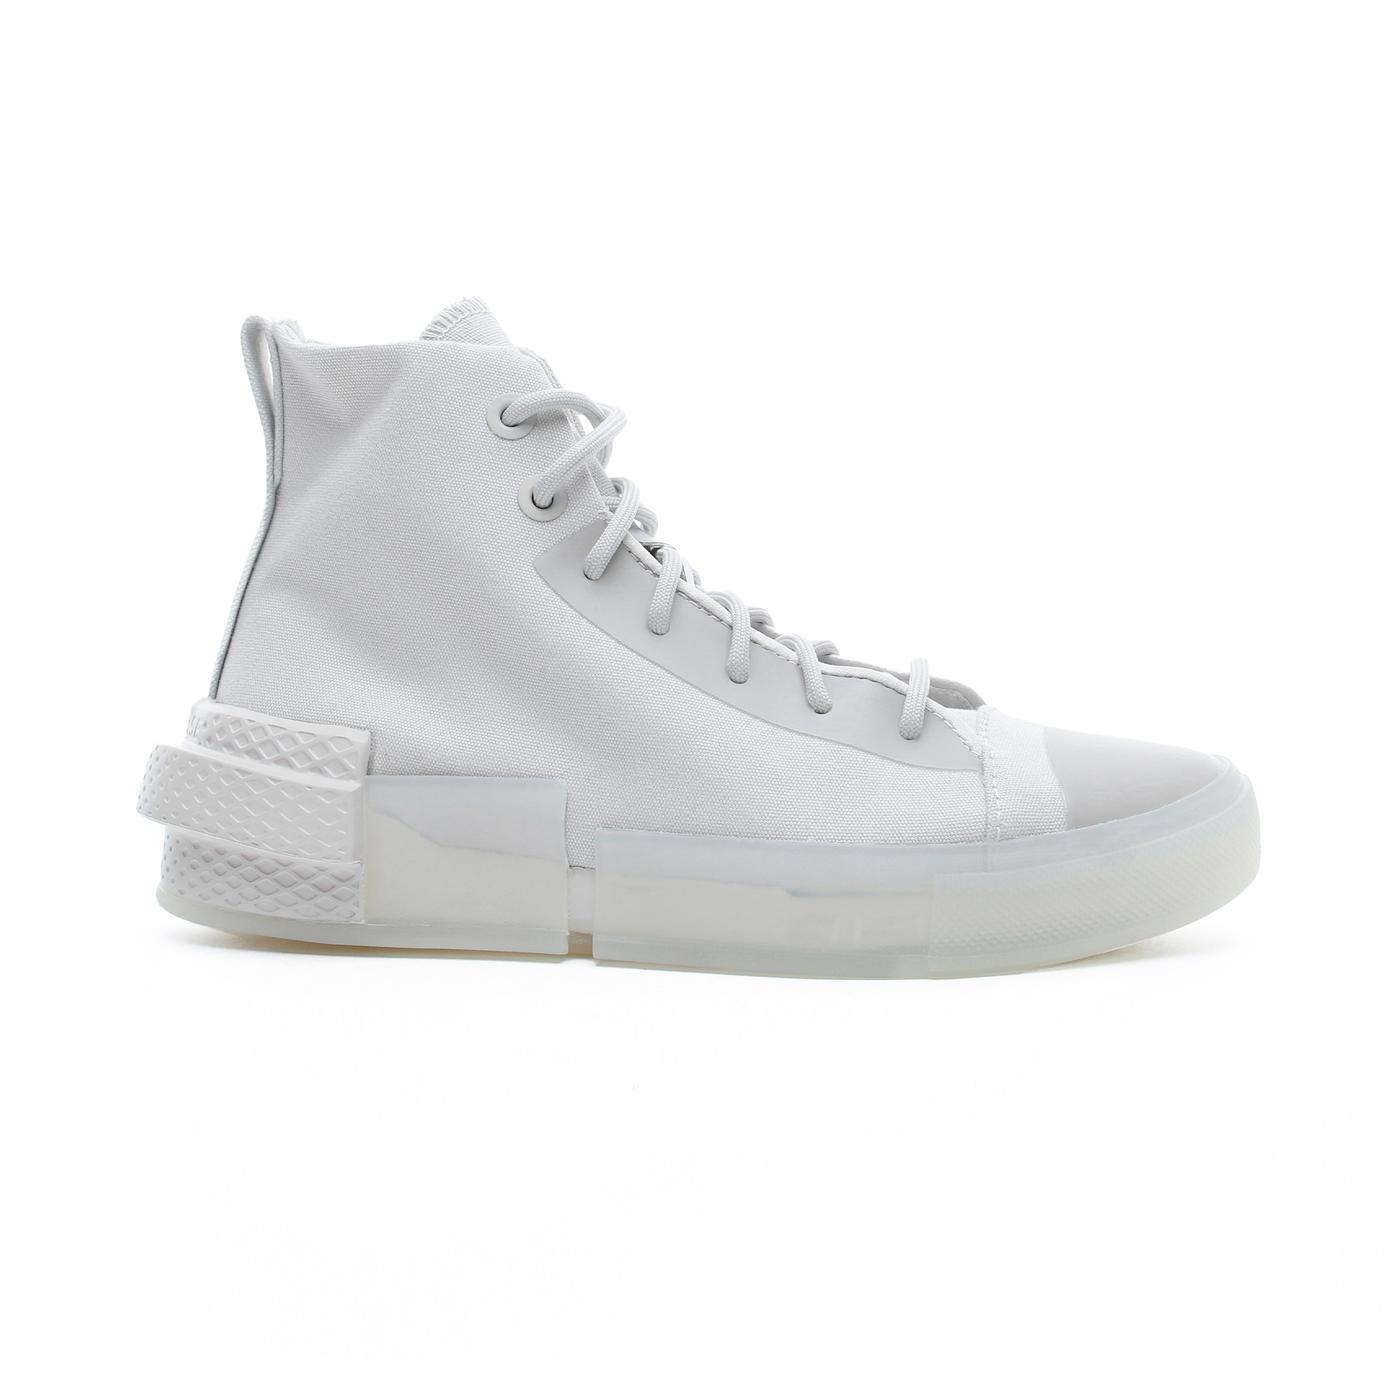 Converse All Star Disrupt CX Hi Unisex Beyaz Sneaker